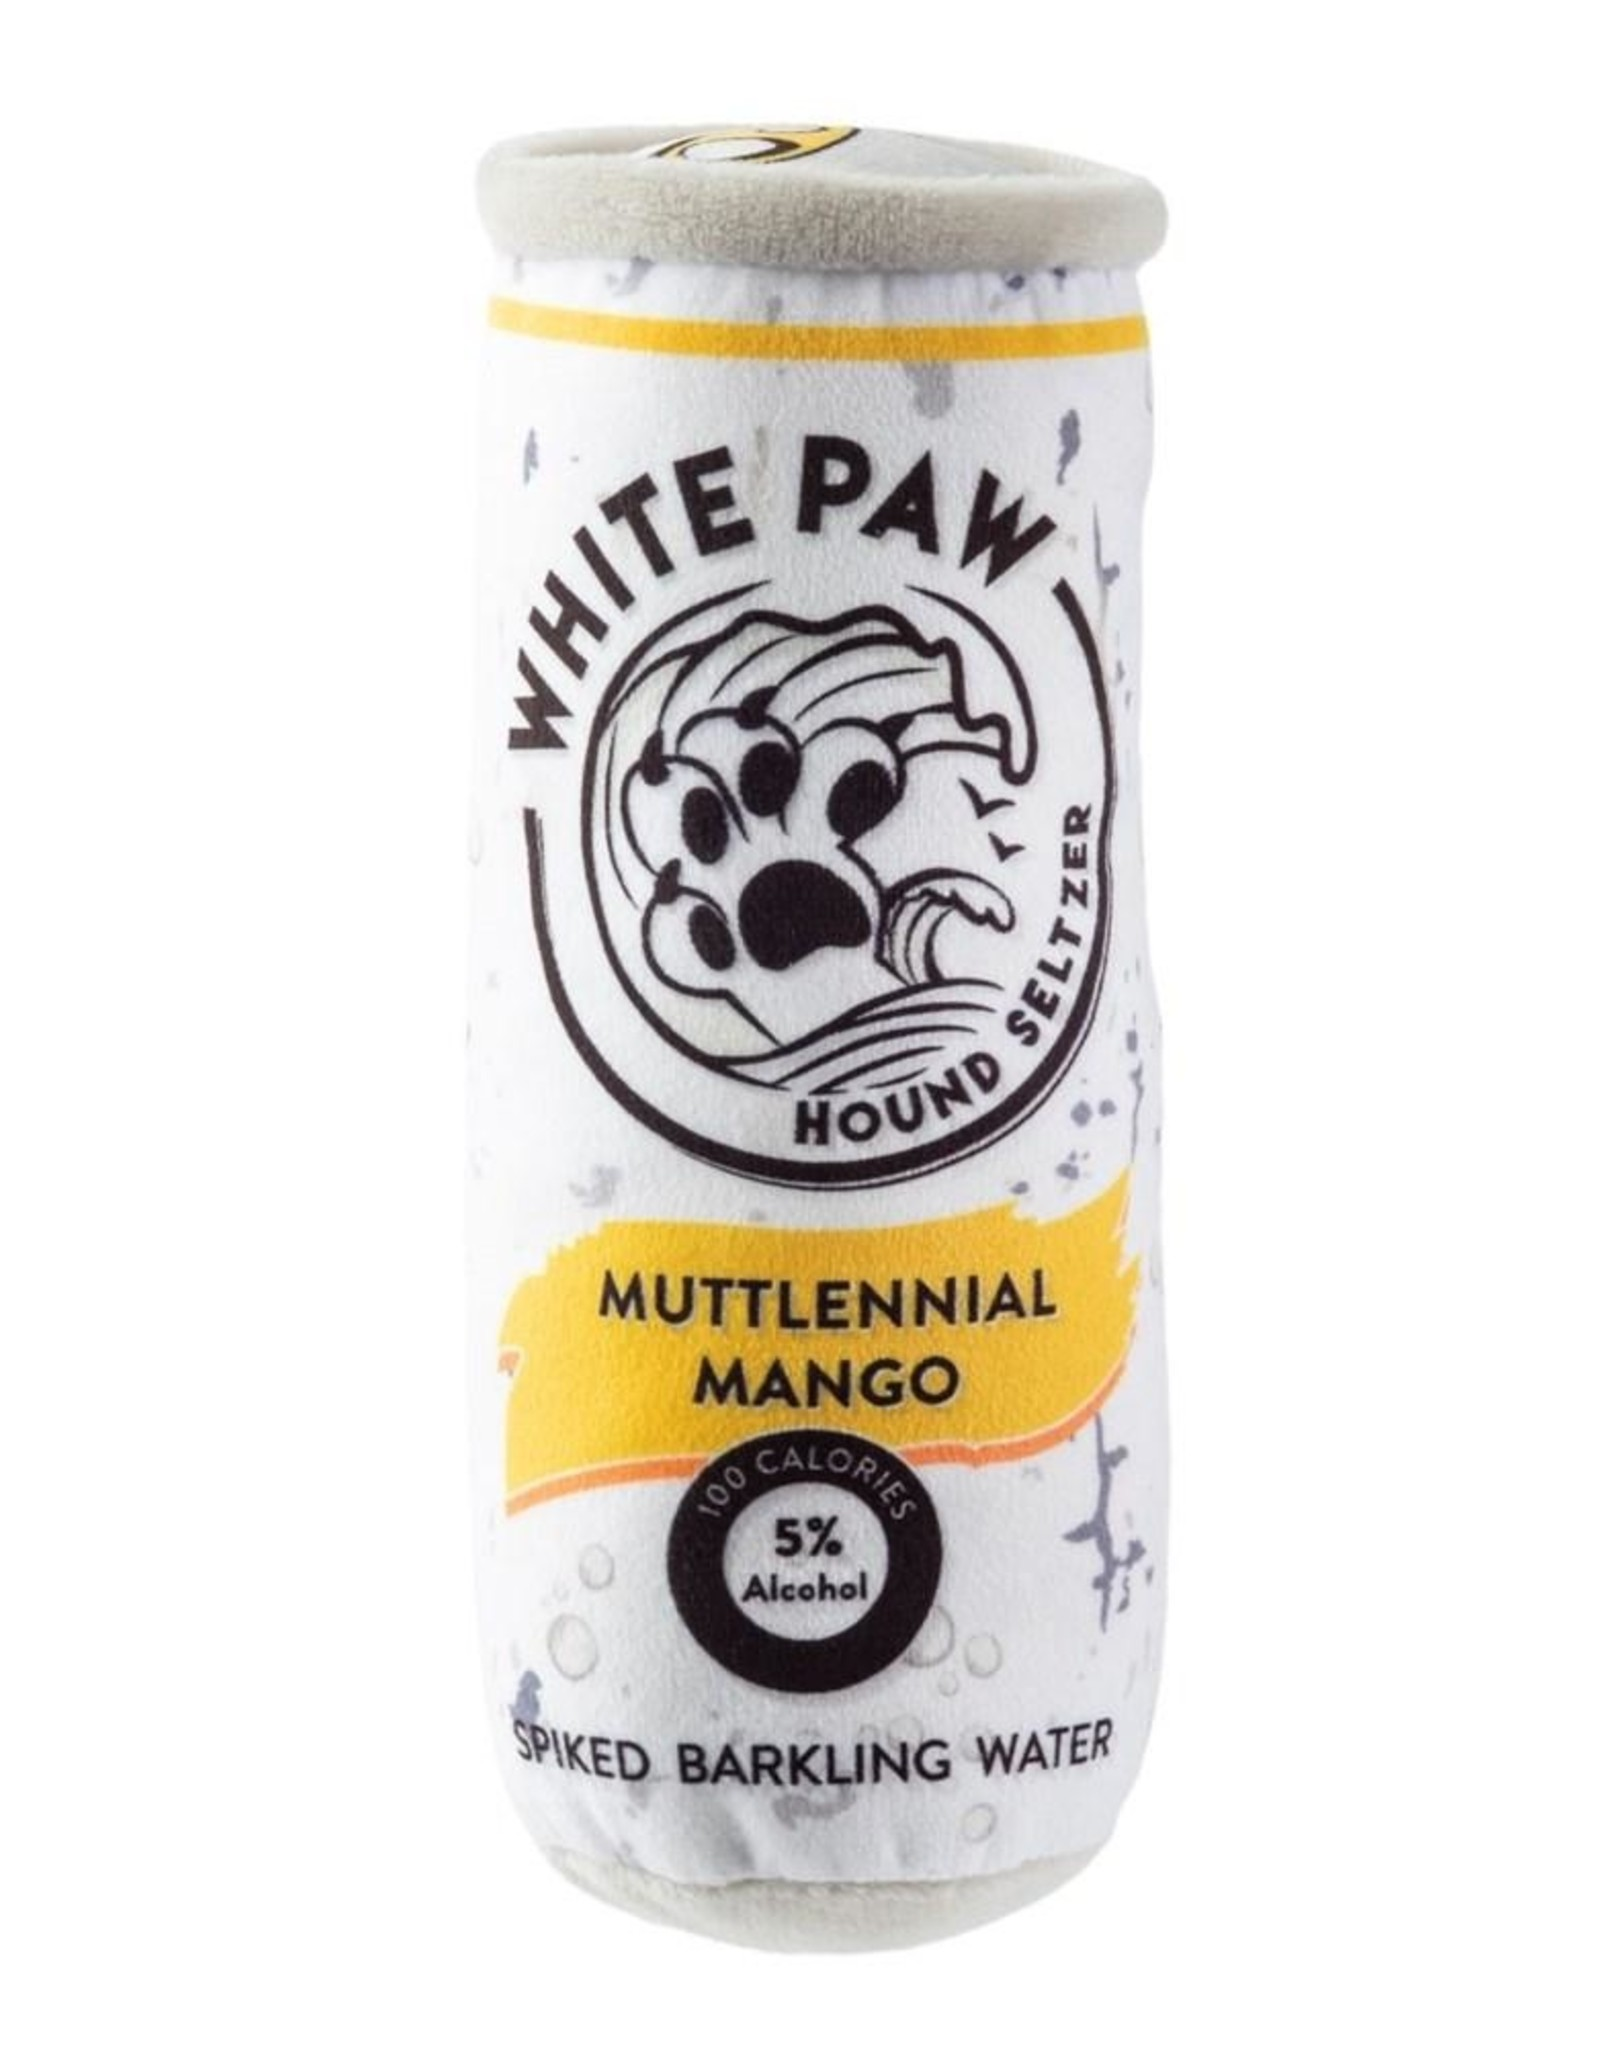 Haute Diggity Dog White Paw Muttlennial Mango